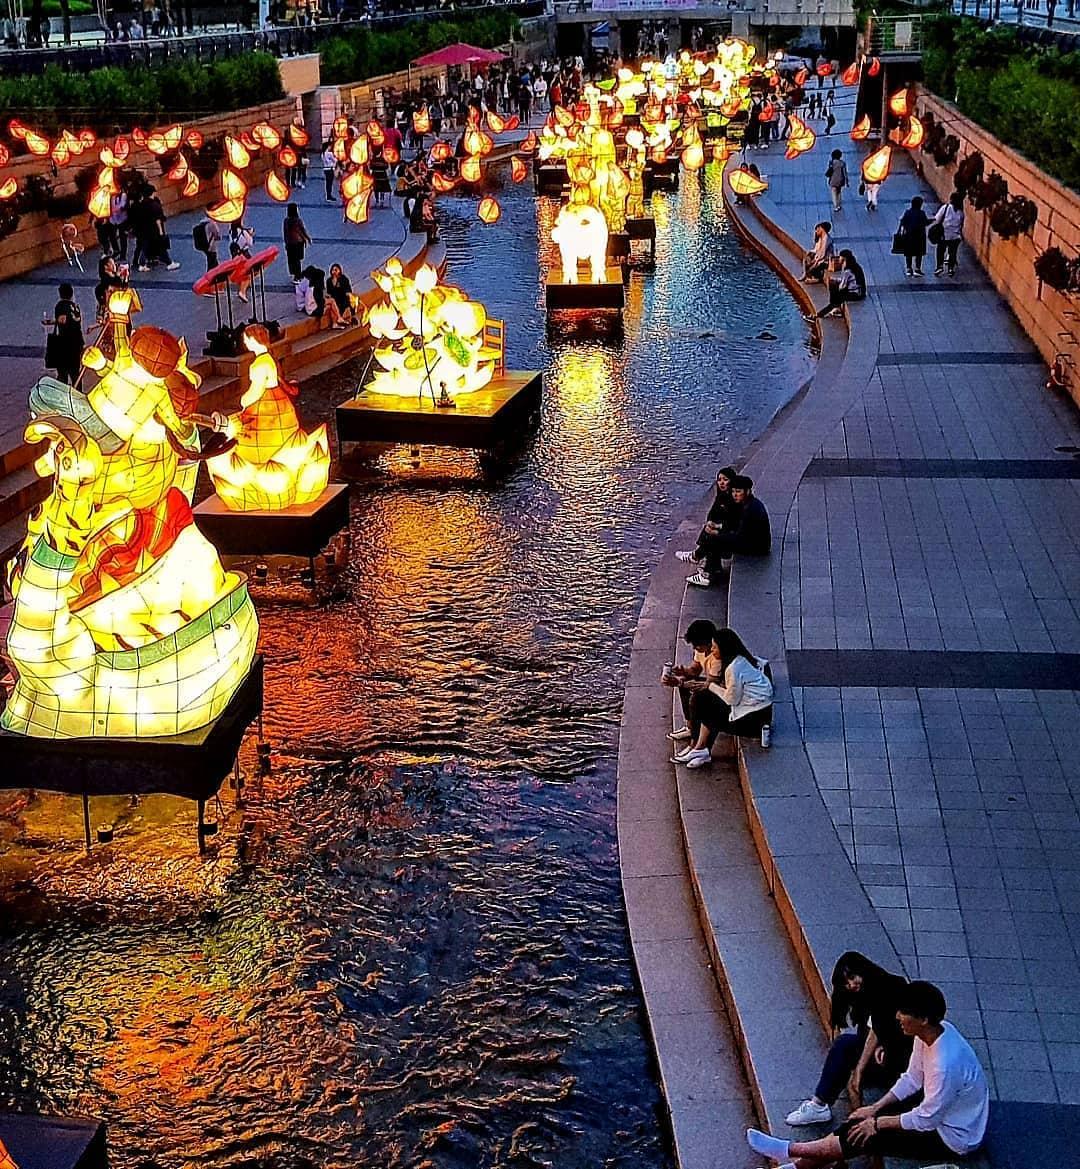 Tour-han-quoc-4n4d- ha-noi-Seoul - lang-phap - tam-sauna-chi-voi-9990000-dong-ivivu-2